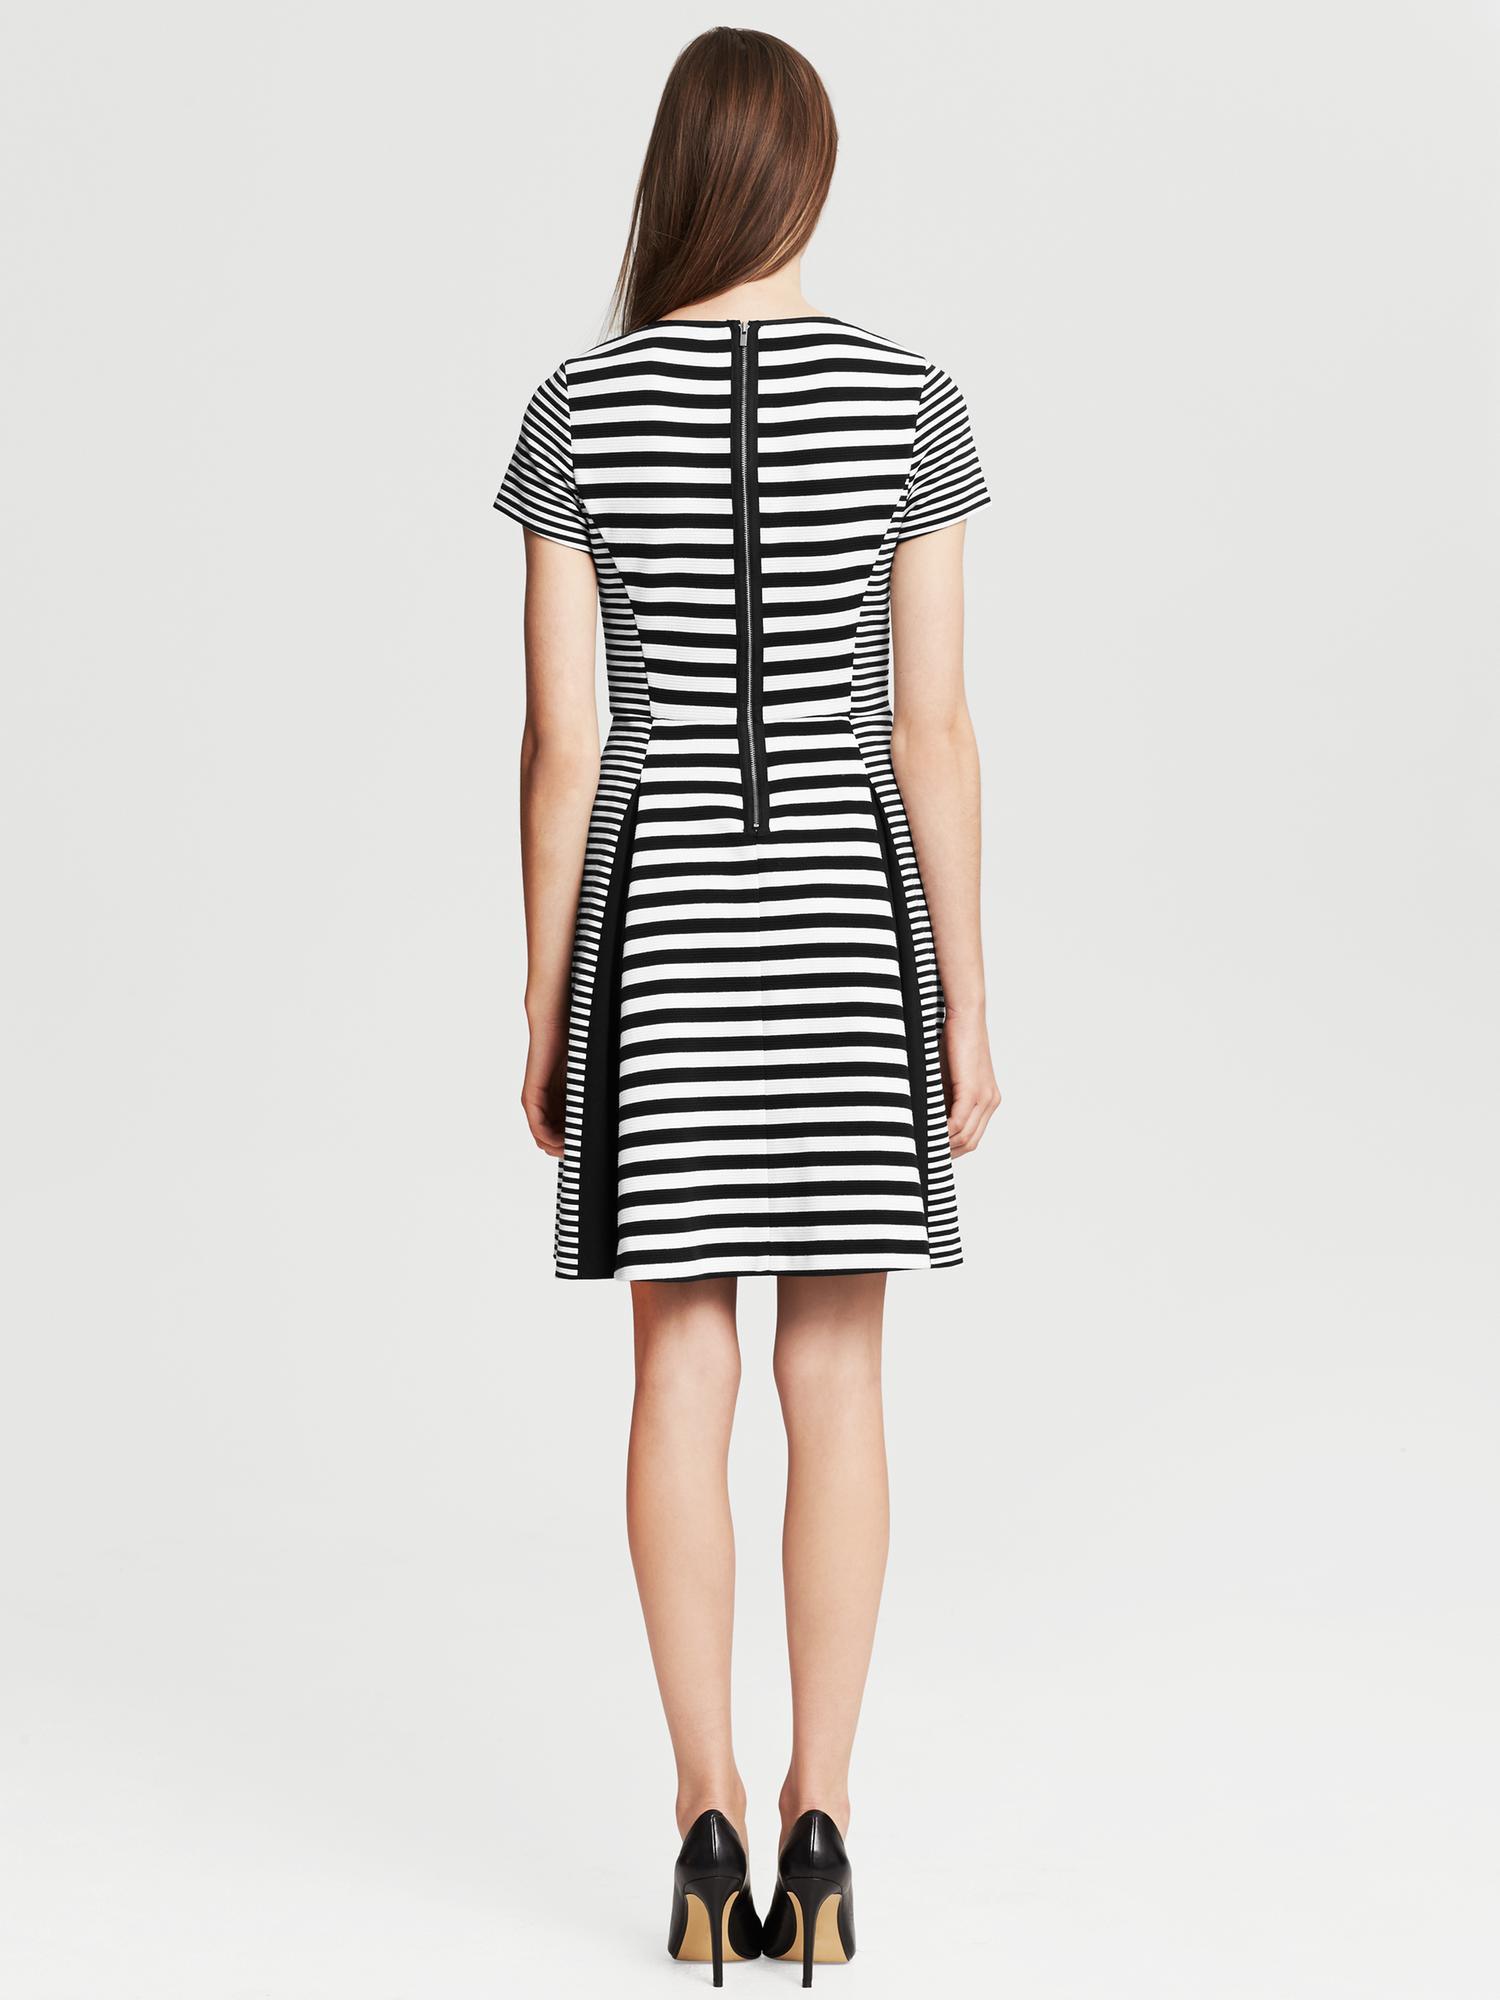 Banana Republic Mixed Stripe Fit And Flare Dress Black